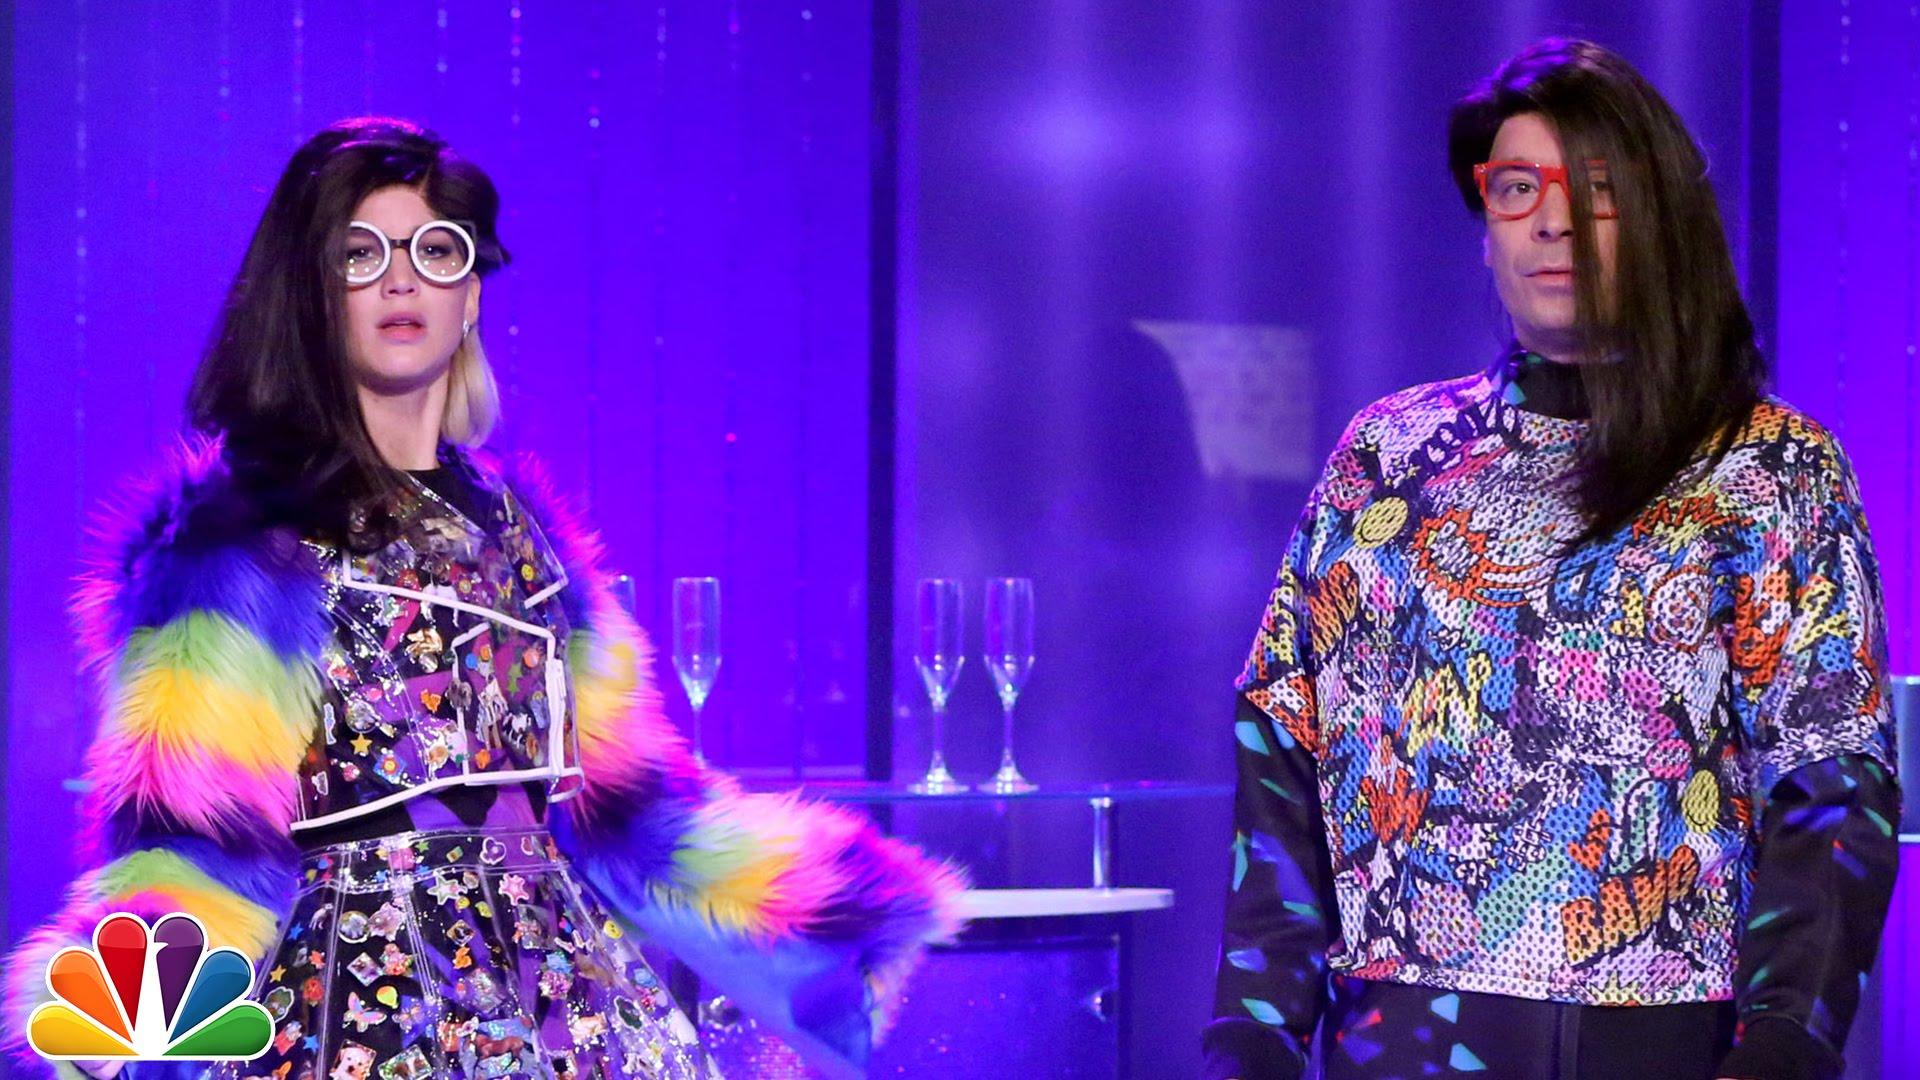 VIDEO: DANCE WITH US Zaplešite i vi poput Jennifer Lawrence i Jimmyja Fallona